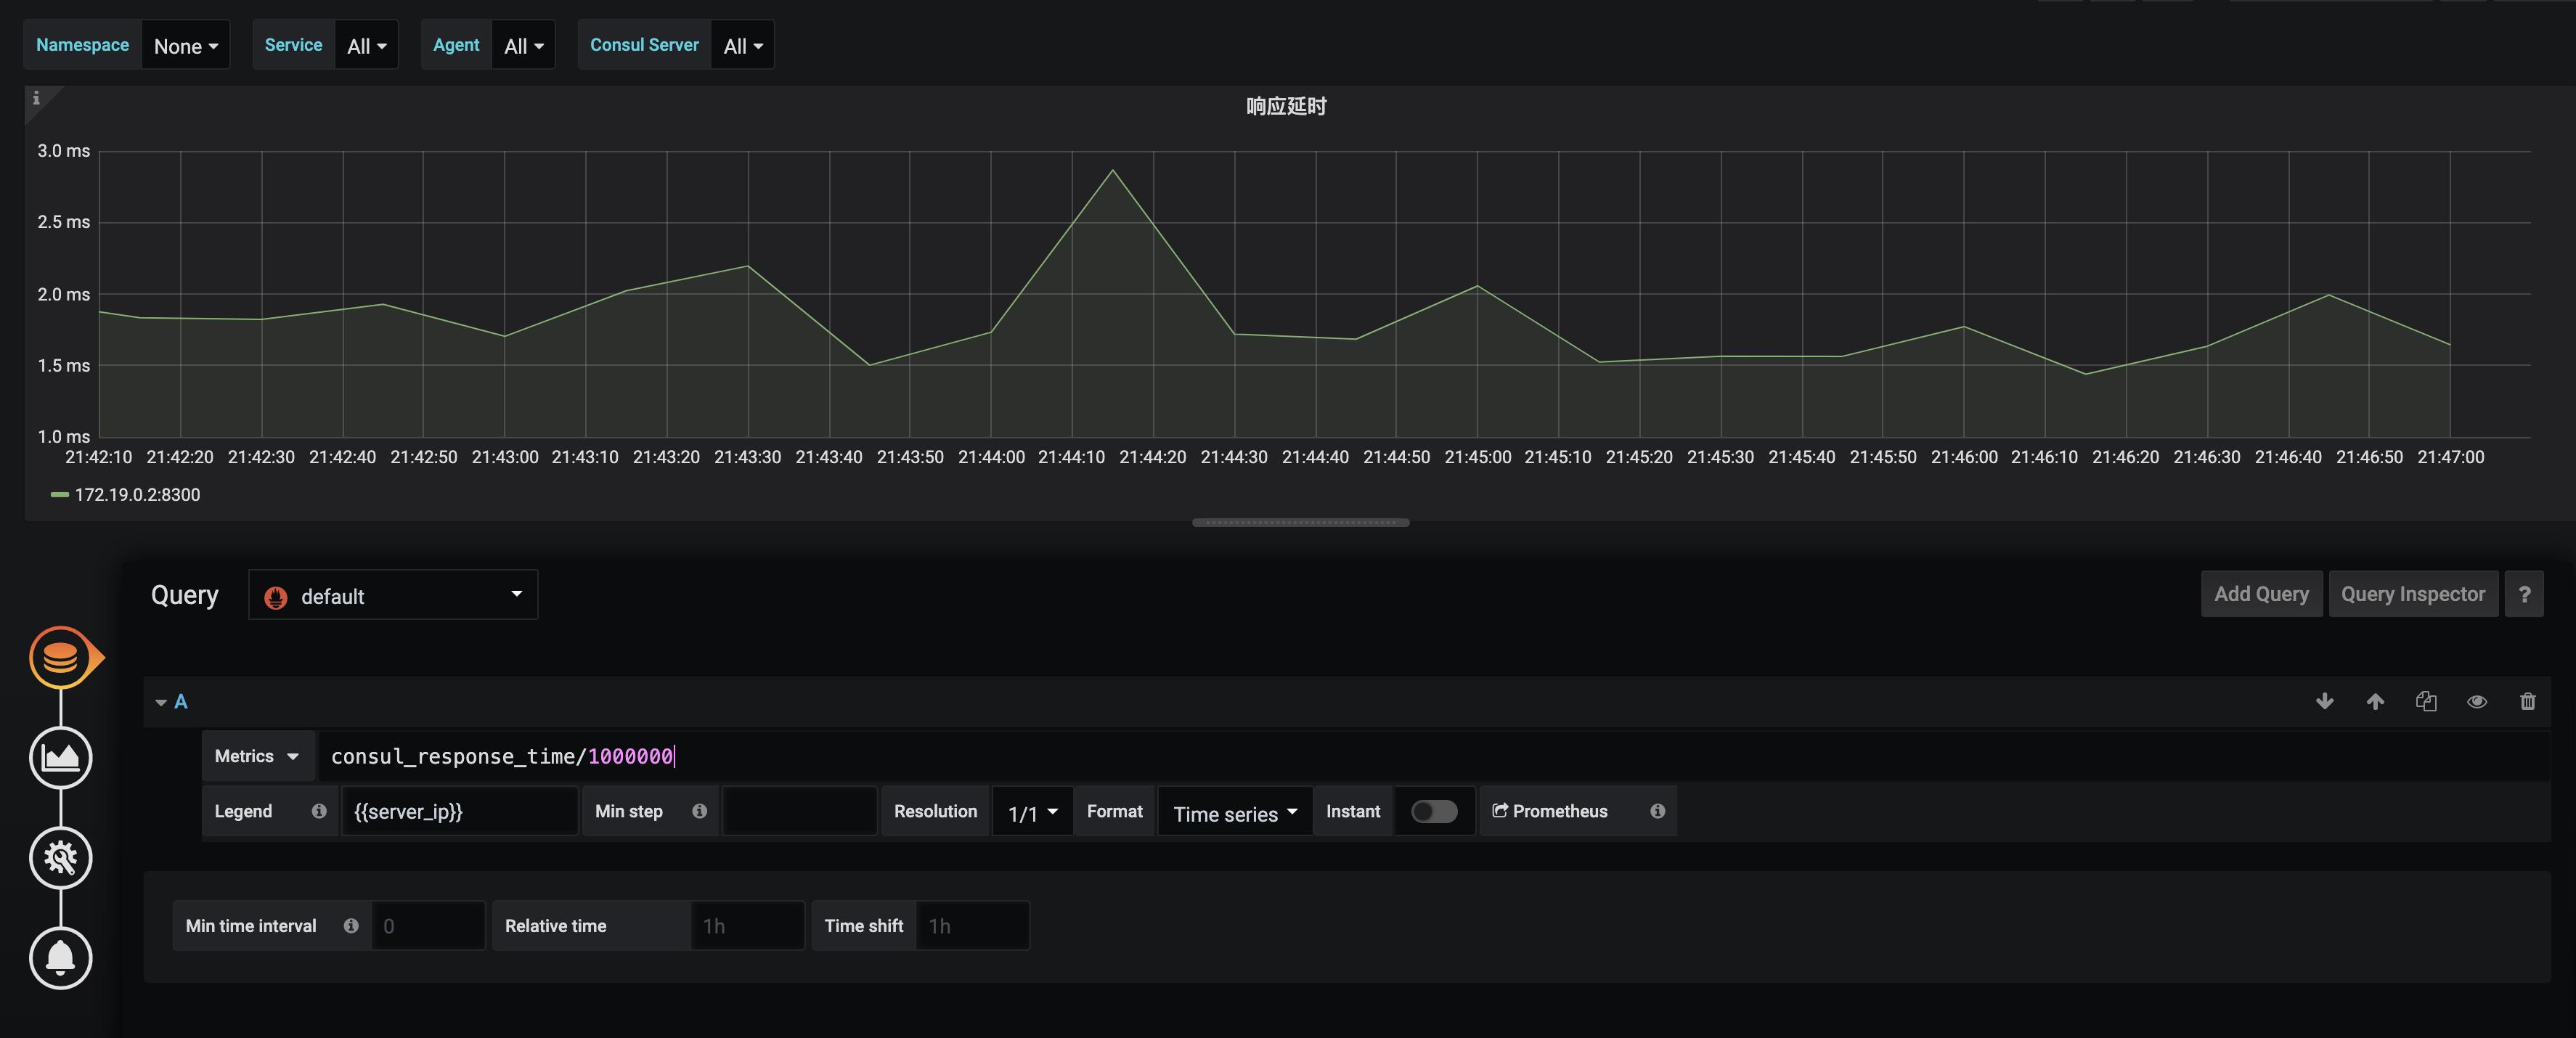 grafana-custom-dashboard-cosnul-reponse-time-grafana.png